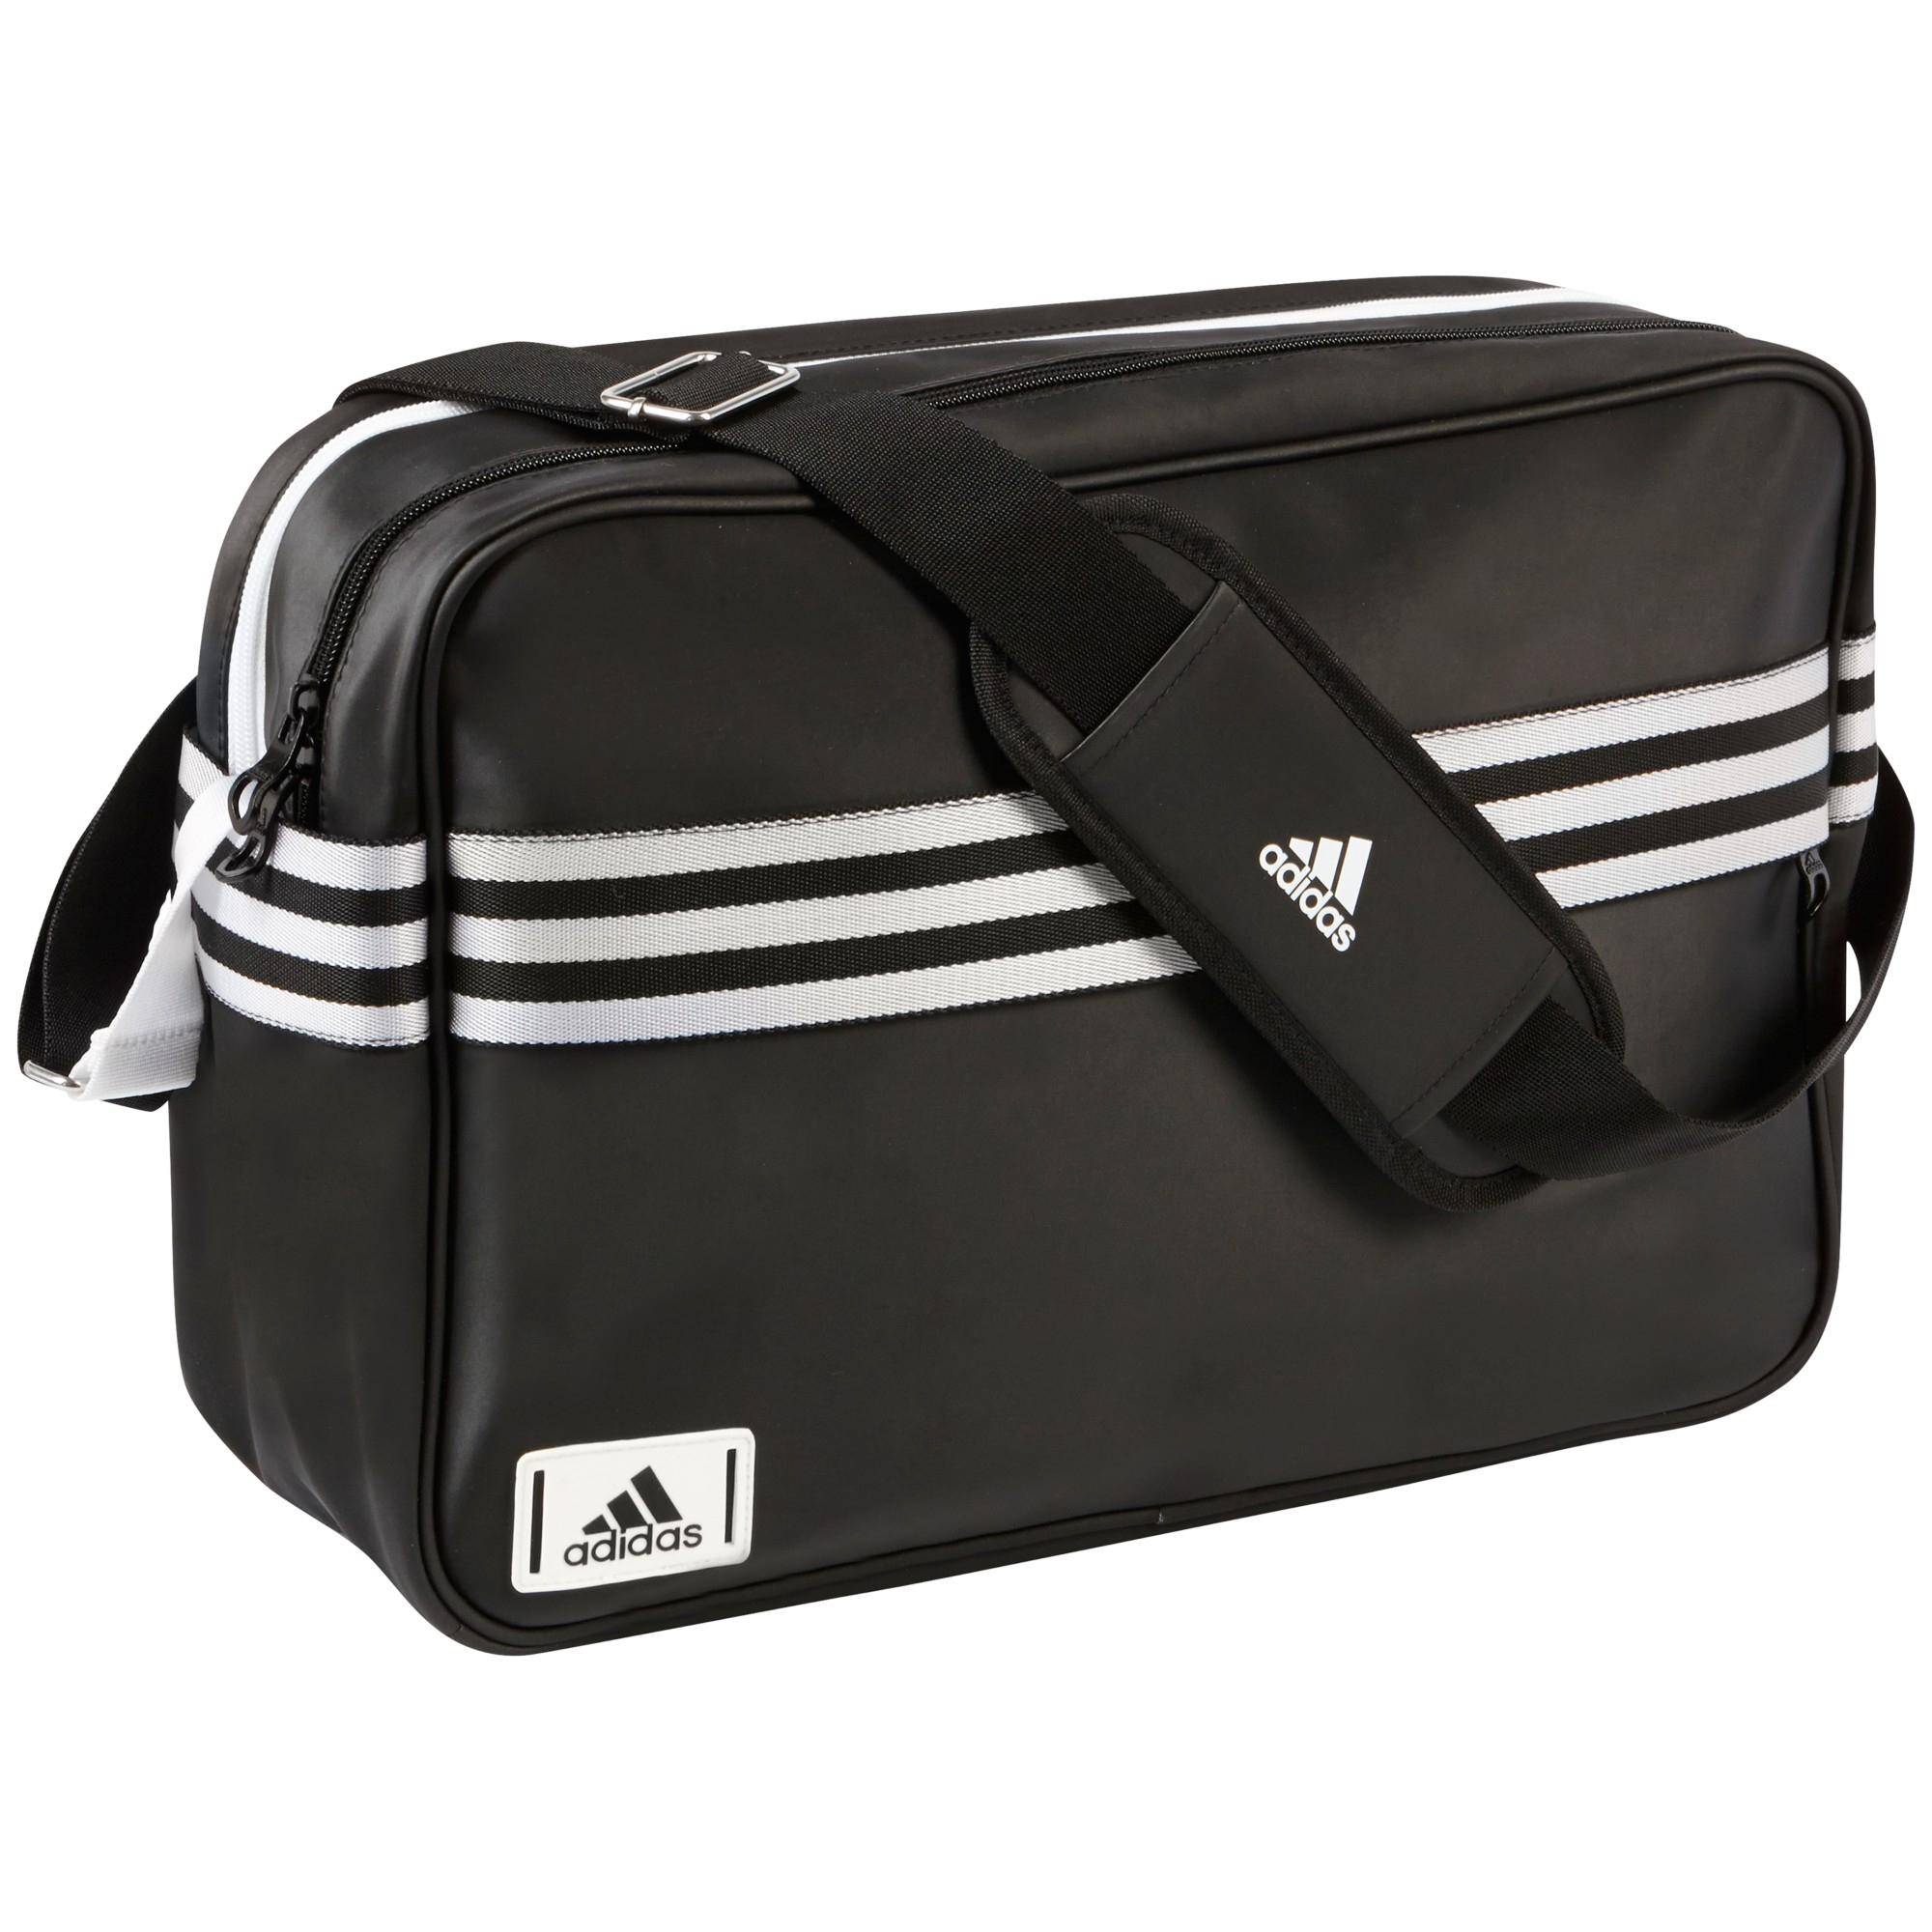 d836831b3ace adidas Enamel Messenger Bag in Black for Men - Lyst